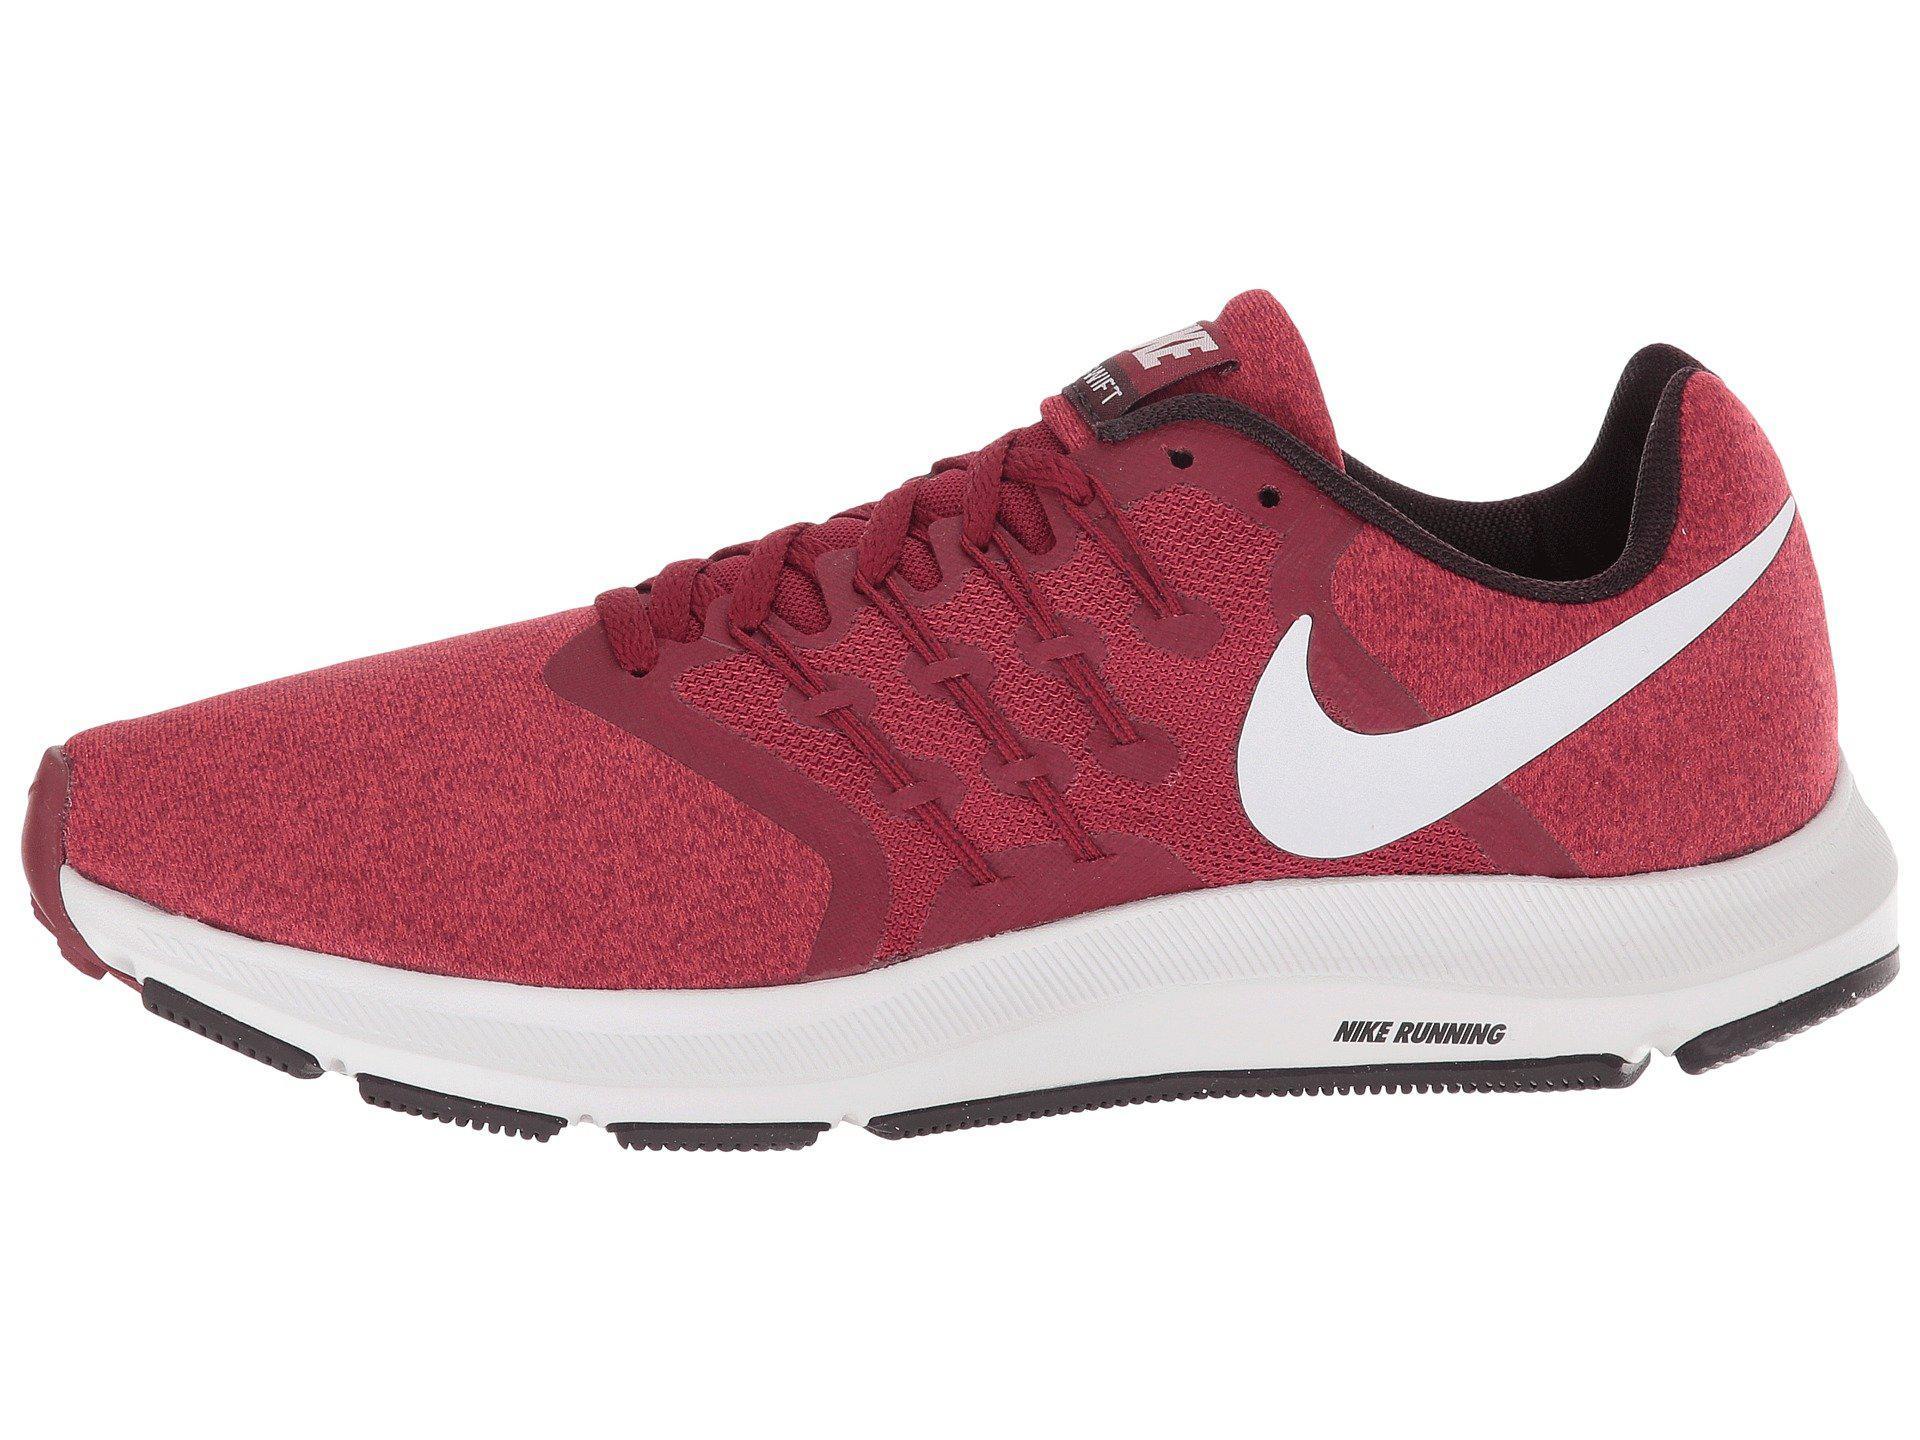 Nike Synthetic Swift Running Shoe in